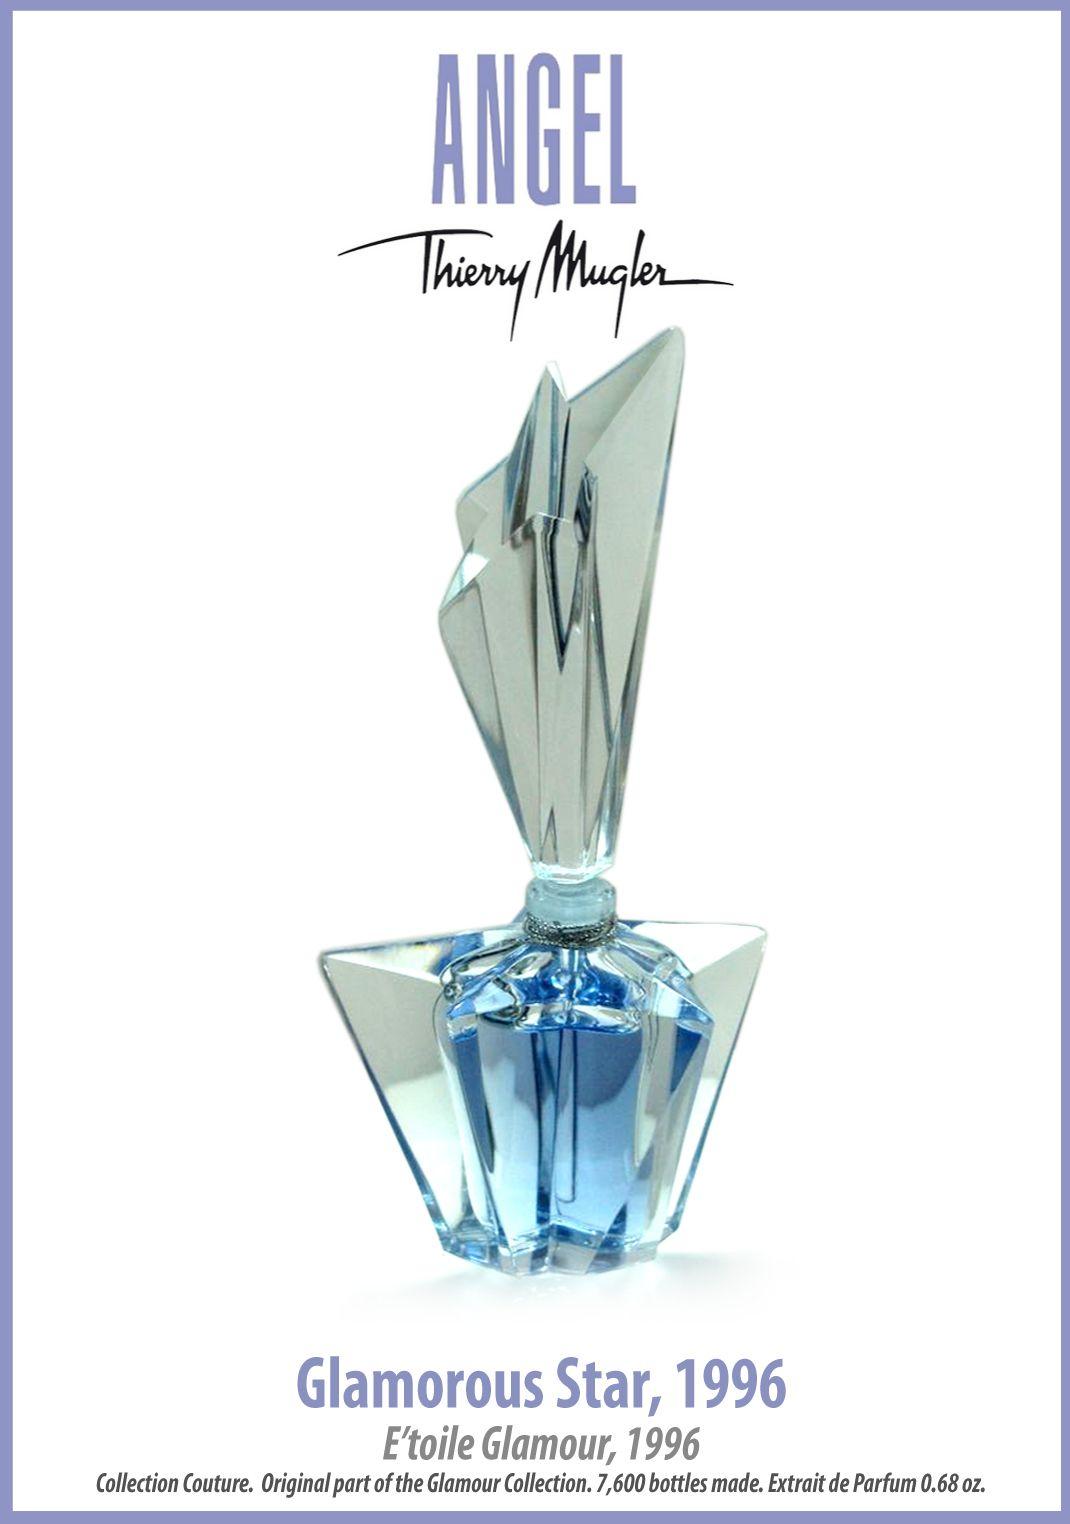 Thierry Mugler Angel Perfume Glamorous Star E Toile Glamour